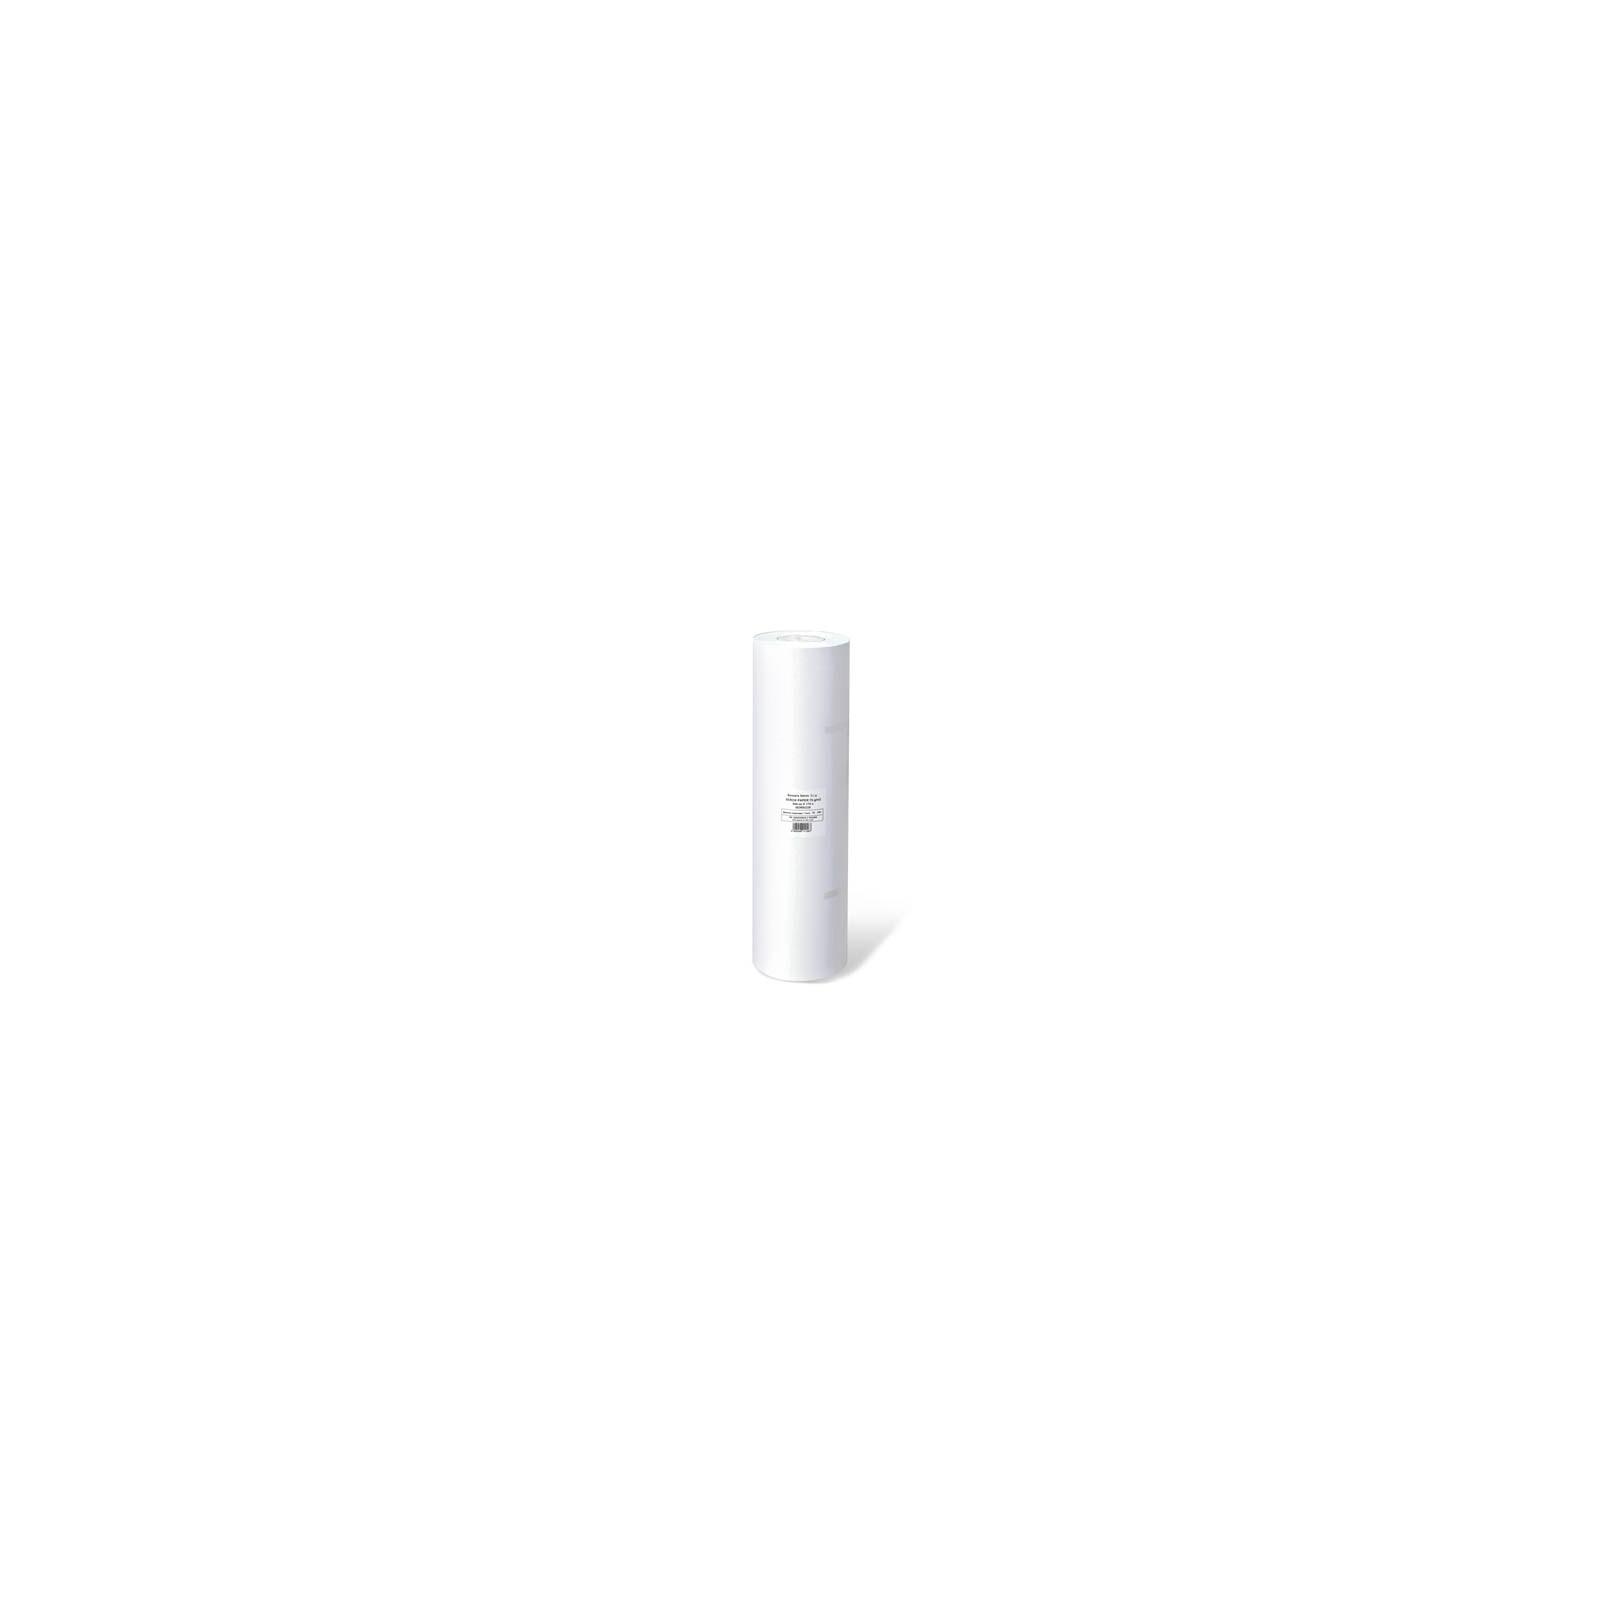 Бумага XEROX A1 XES Glued (496L94043)